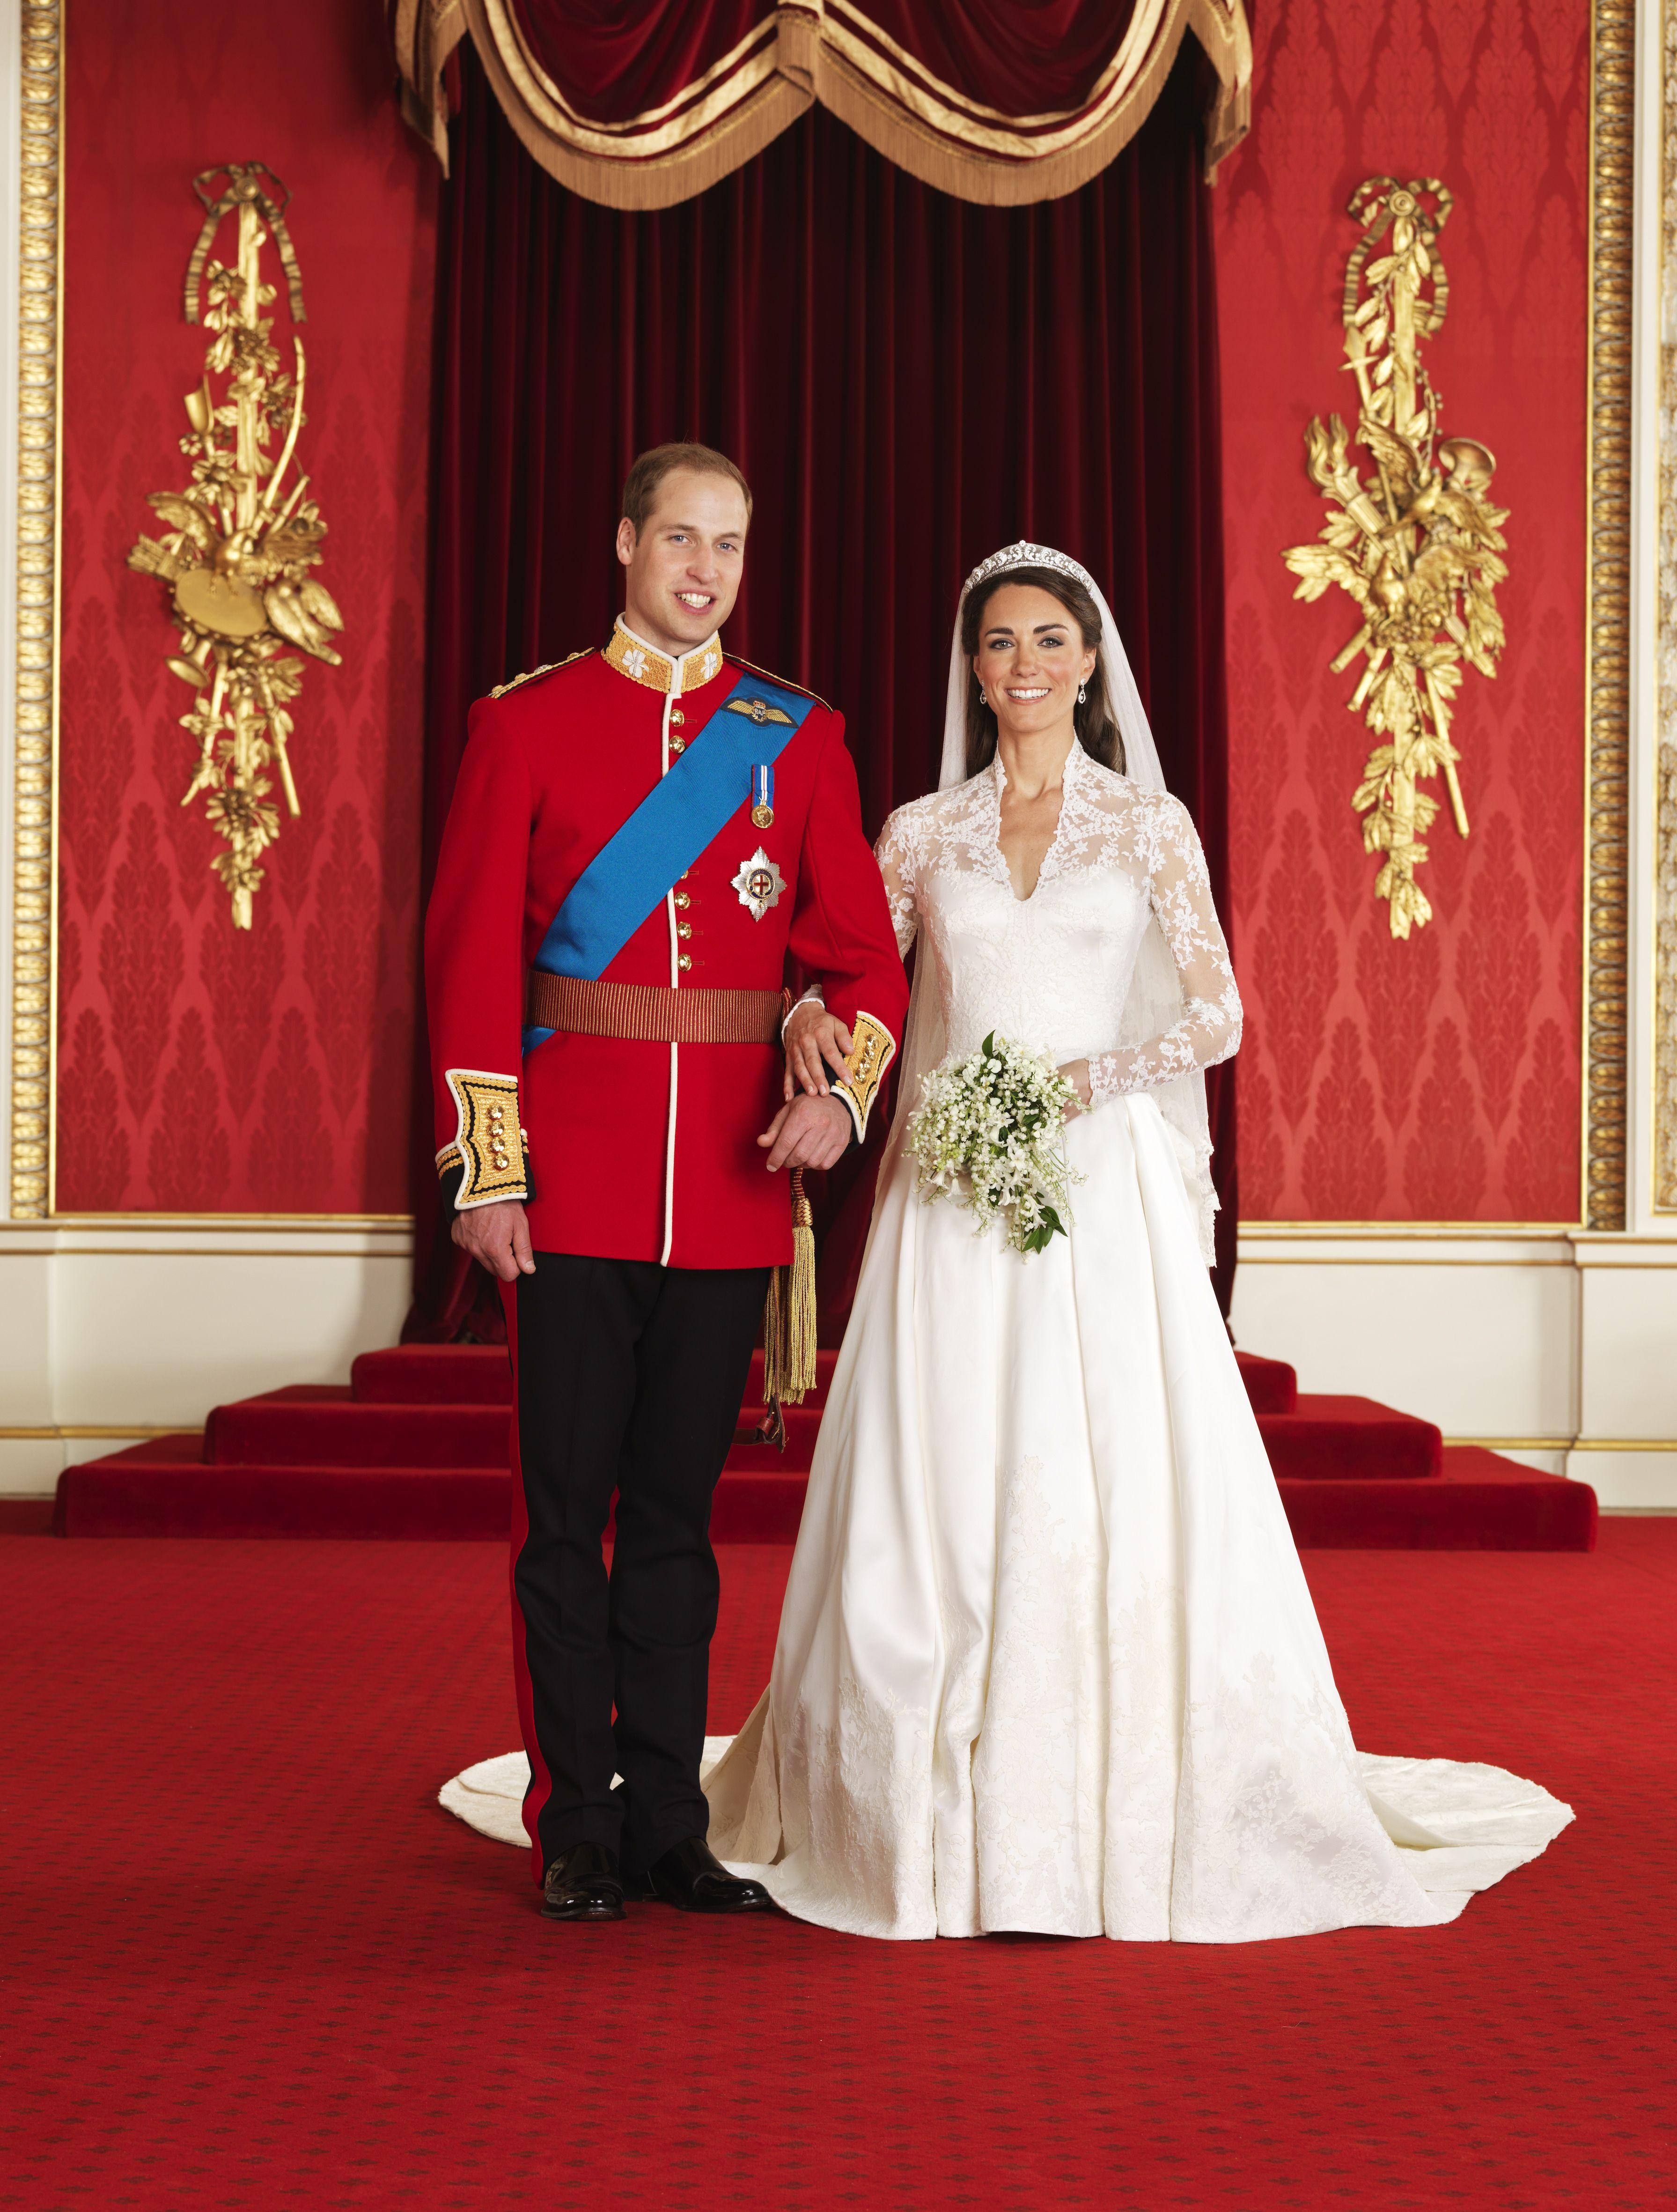 The Kate and Wills Royal Wedding